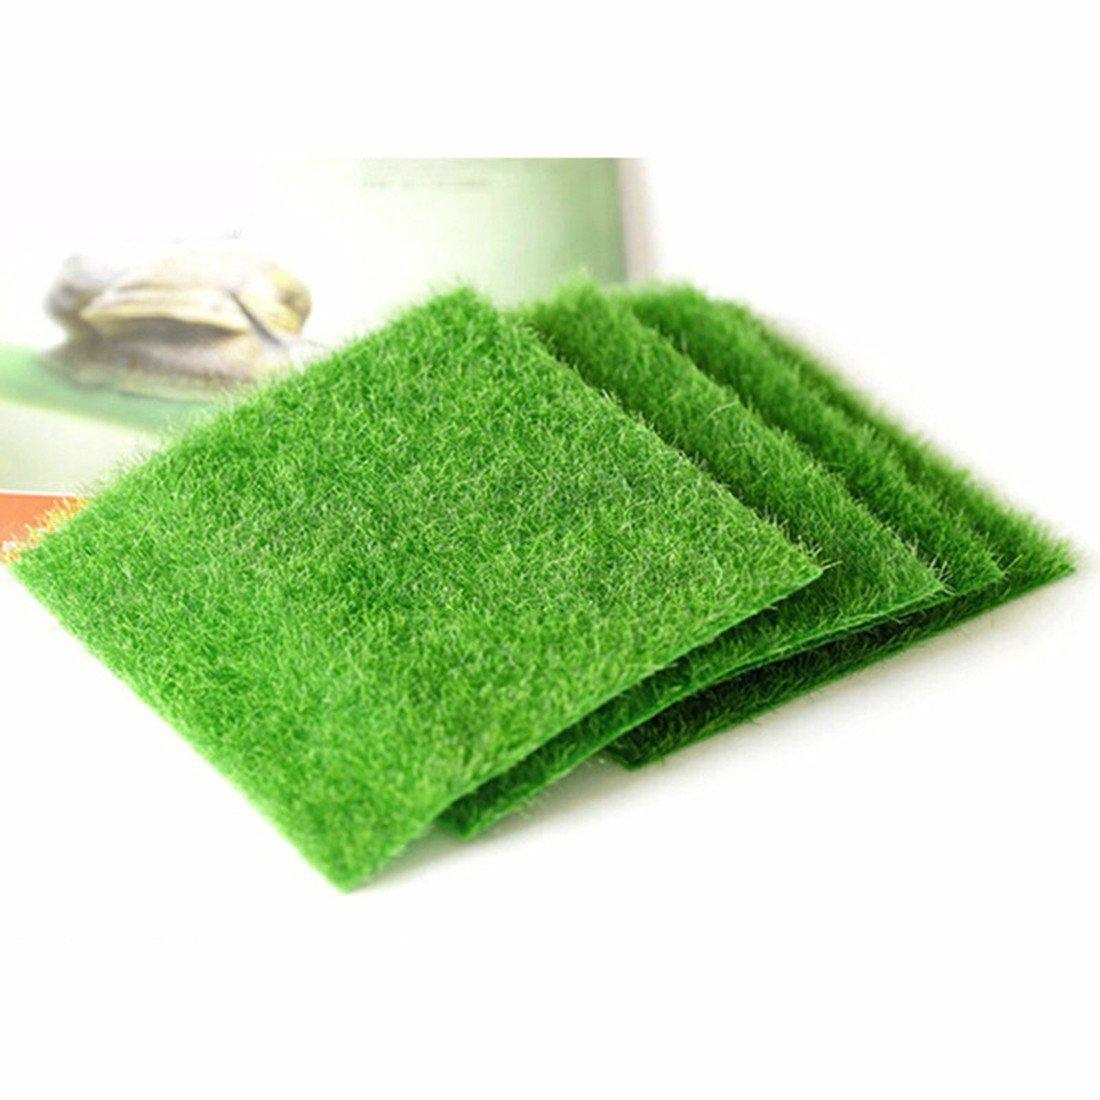 Artificial Grass Fake Lawn Fake Grass Miniature Dollhouse Home Garden D¨¦cor